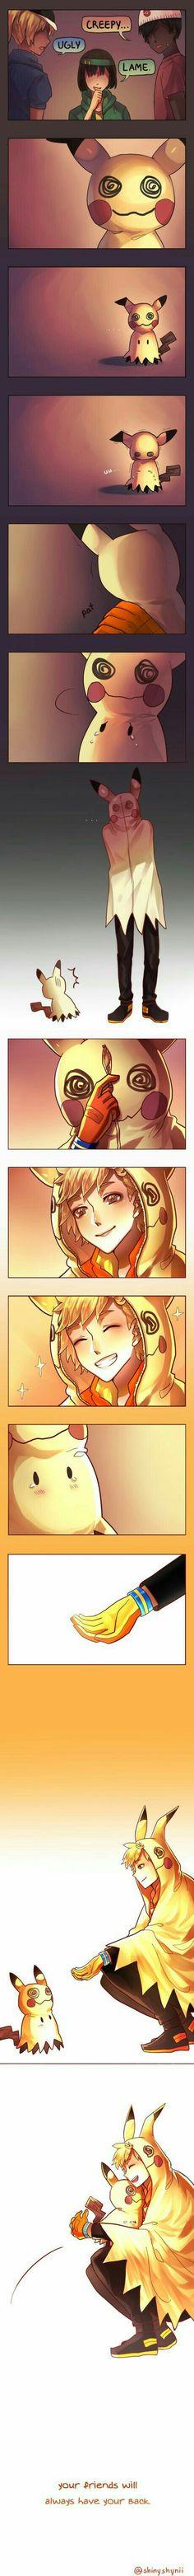 Spark, you precious cinnamon roll that loves all Pokemon